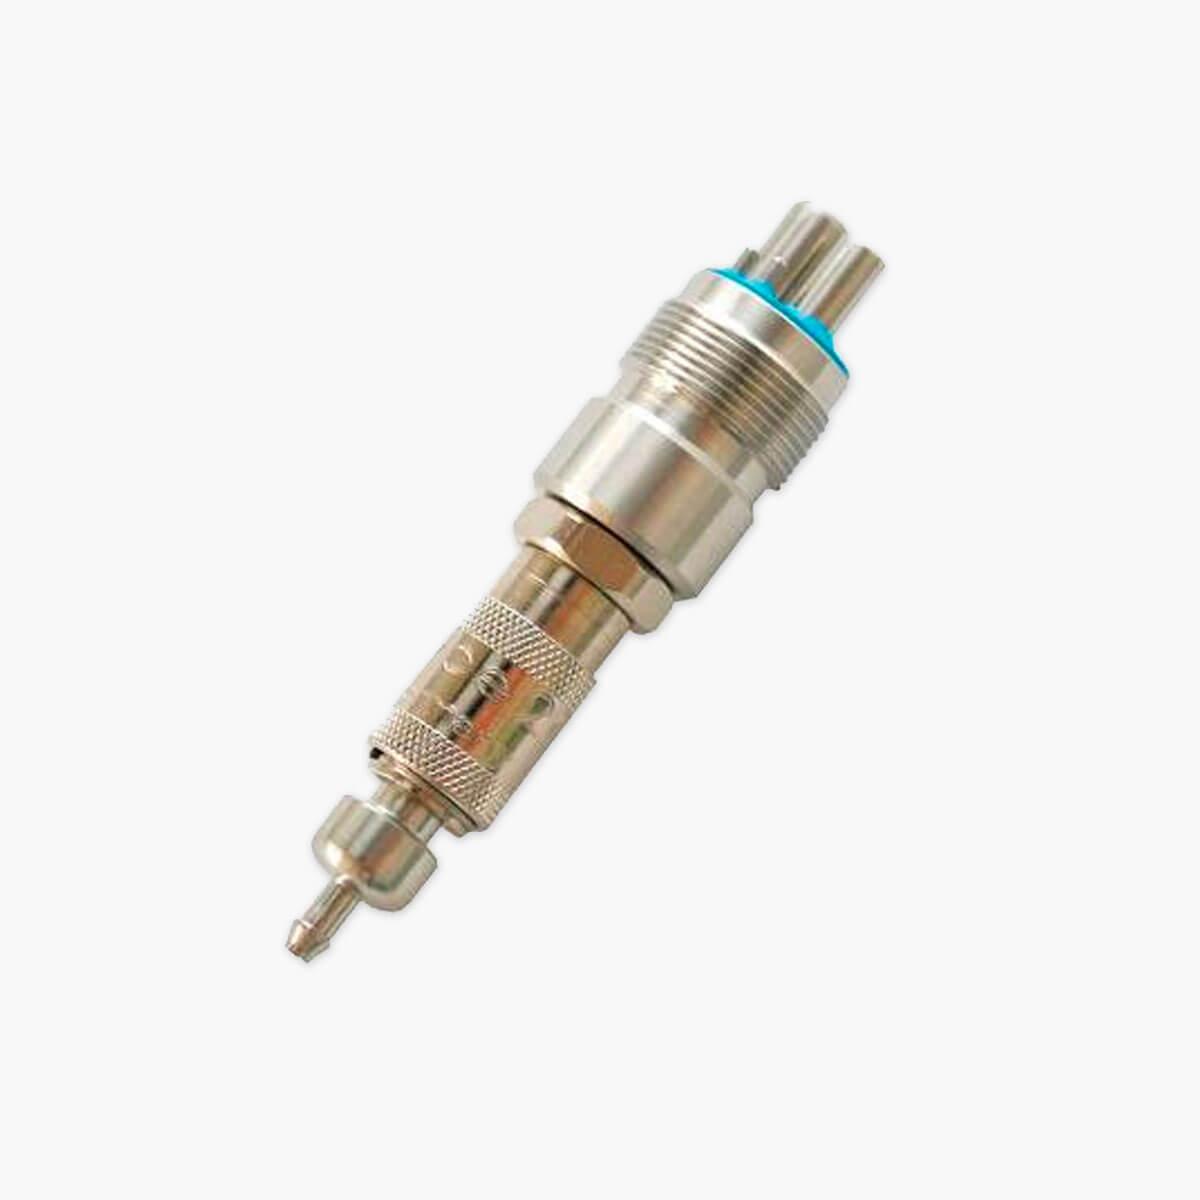 konnektorer002